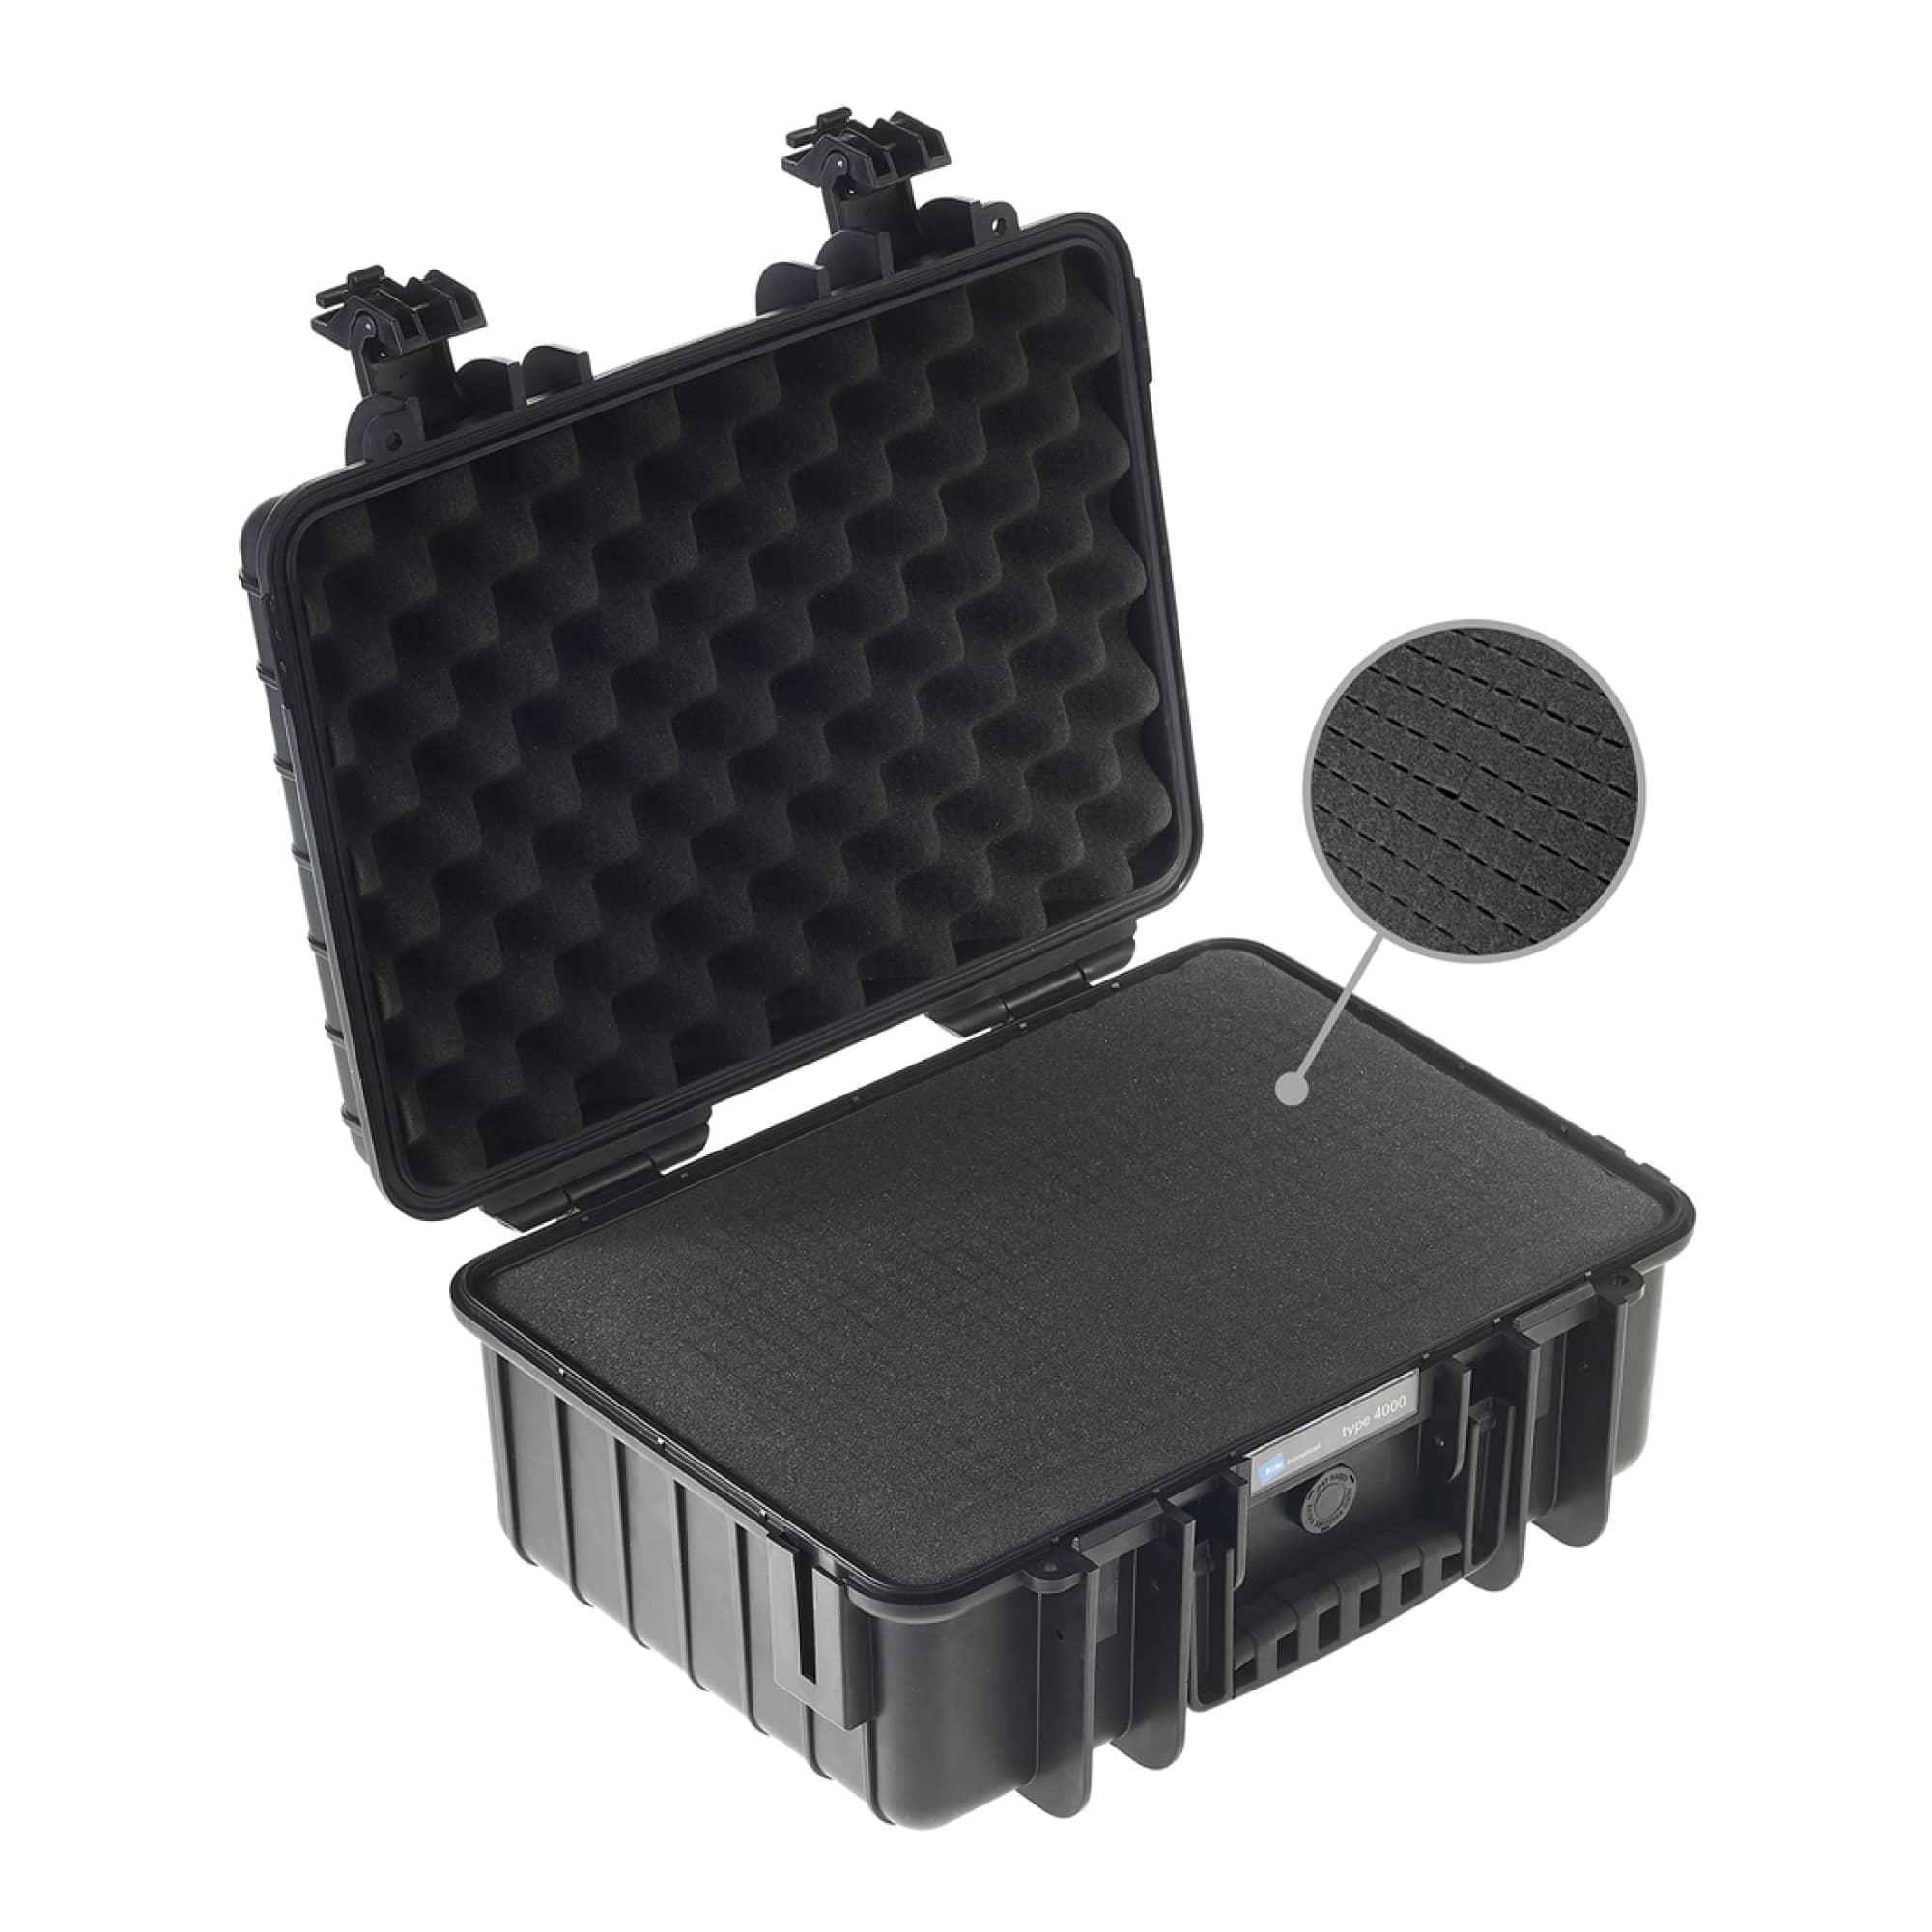 B&W Outdoor Case Typ 4000 black with pre-cut foam (SI)